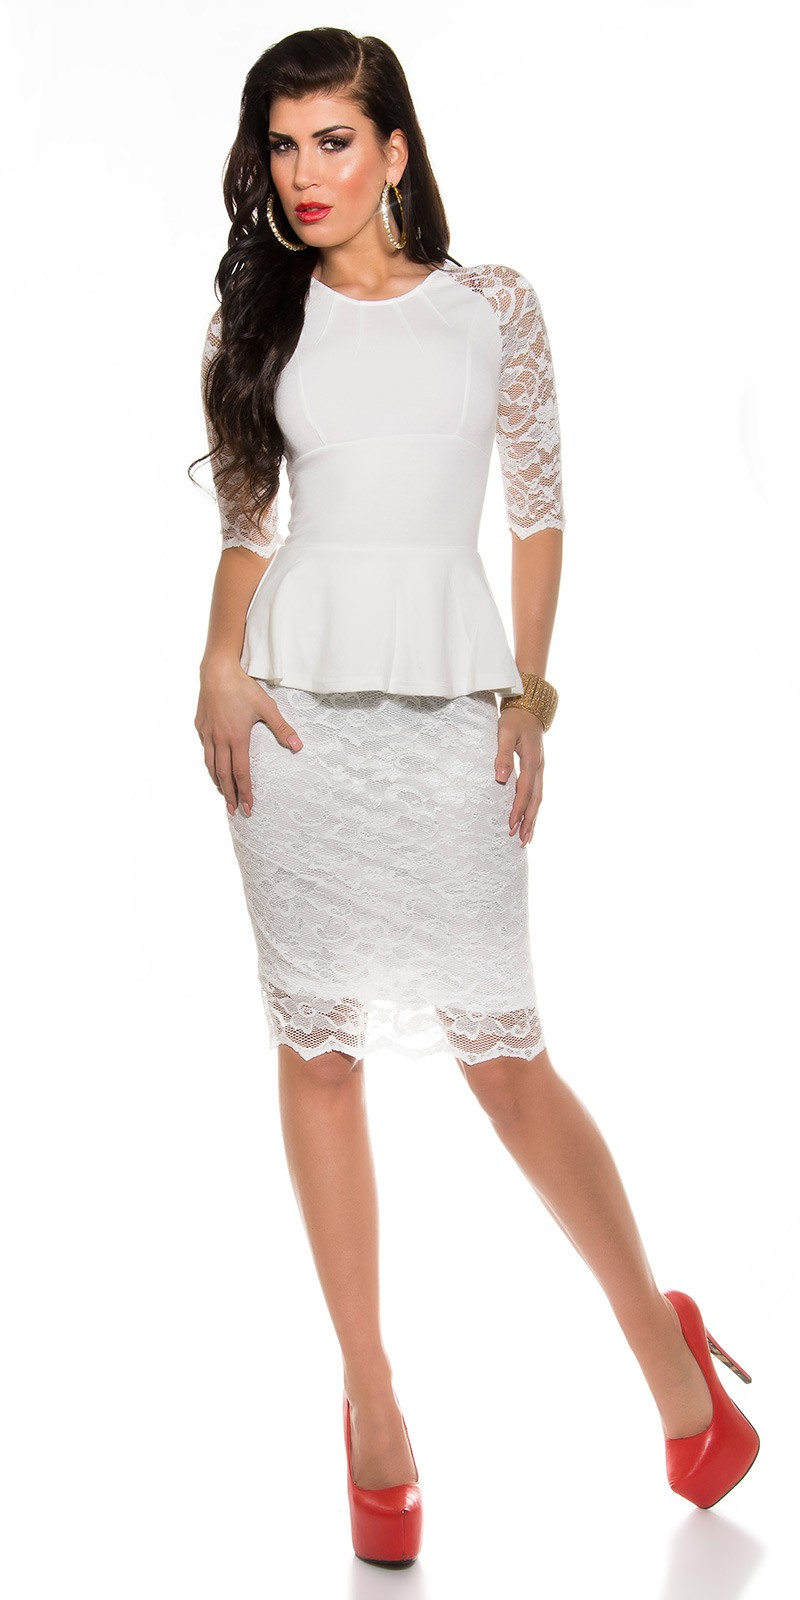 Elegáns peplum - csipke női ruha - Fehér (36-40) empty ee5d0bfd30